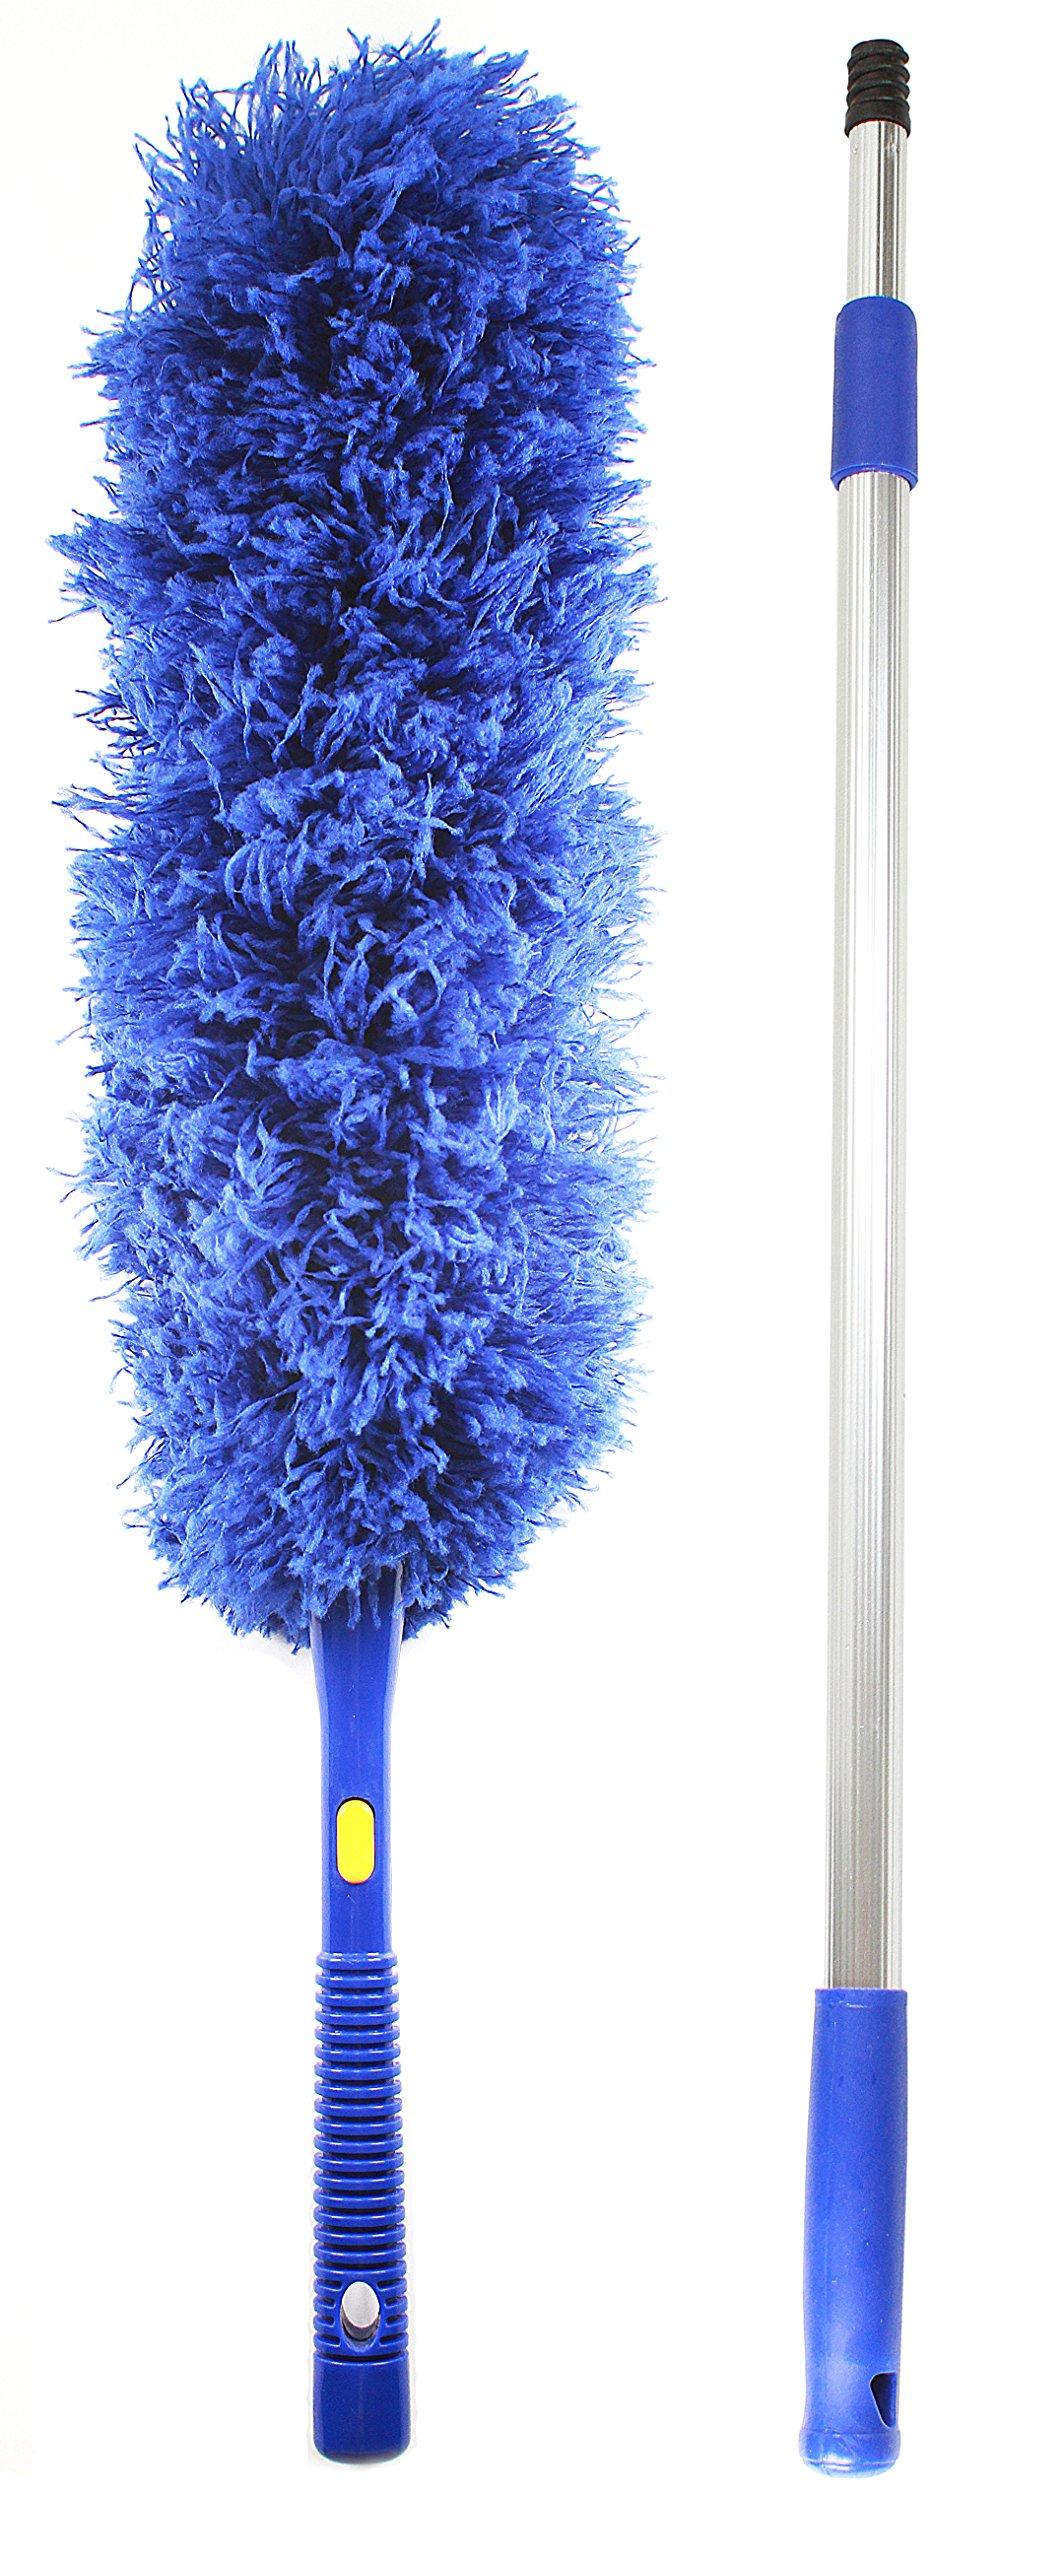 Jet Clean Microfiber Hand Duster-Feather Dust Appliances, Ceiling Fans, Blinds, Furniture, Shutters, Cars, Delicate Surfaces-Extension Pole Reach 25-44''